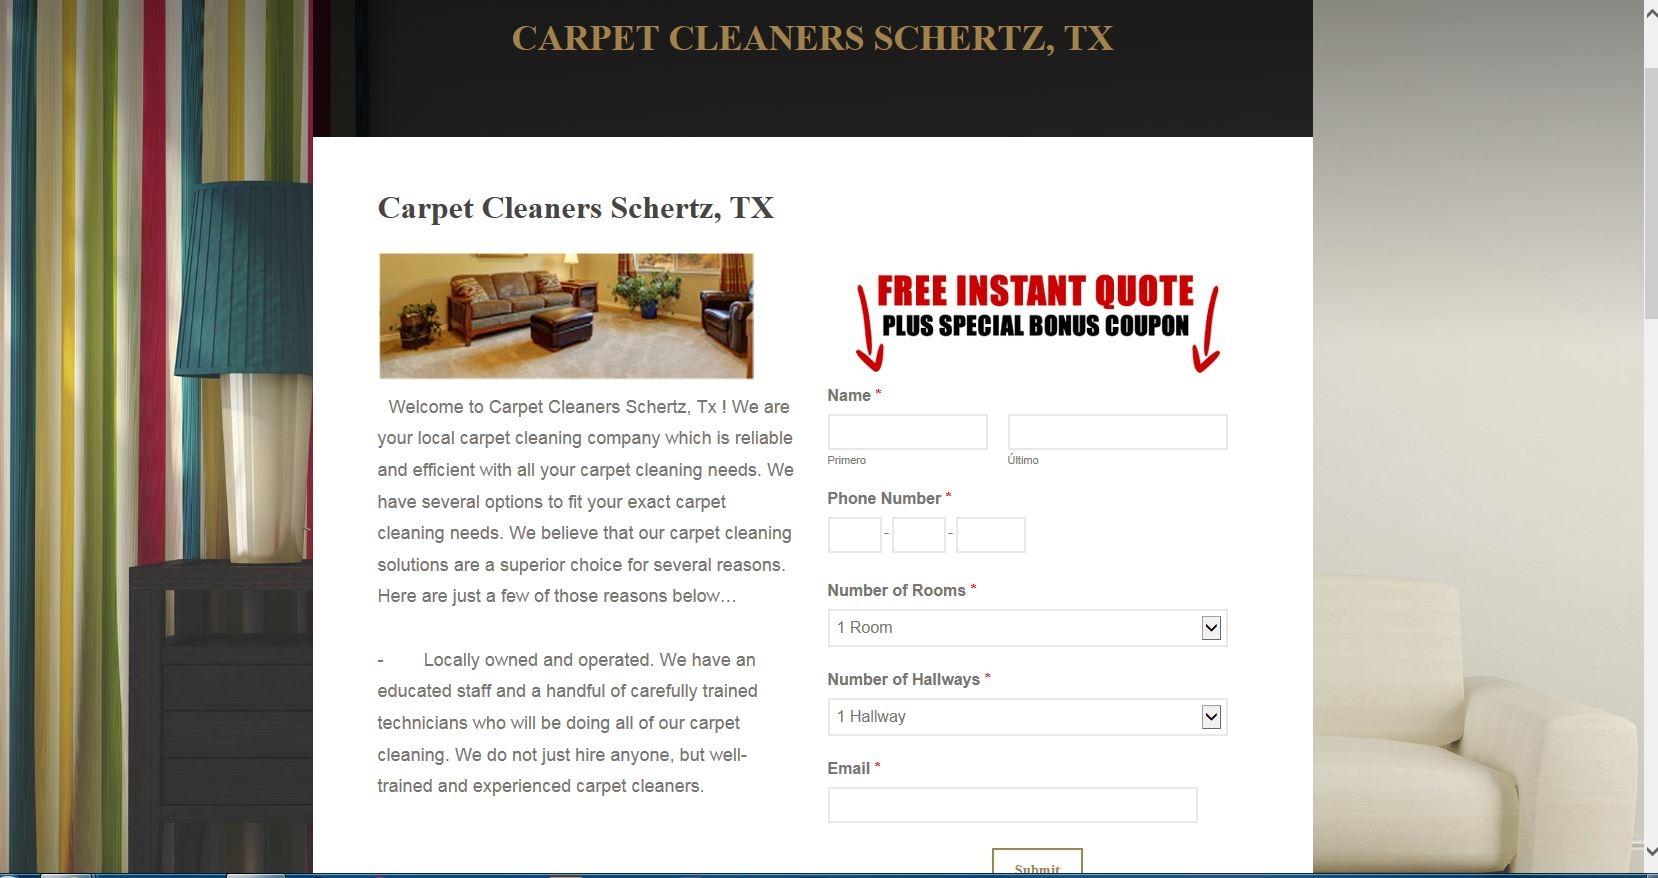 Schertz/San Antonio Carpet Cleaners image 1